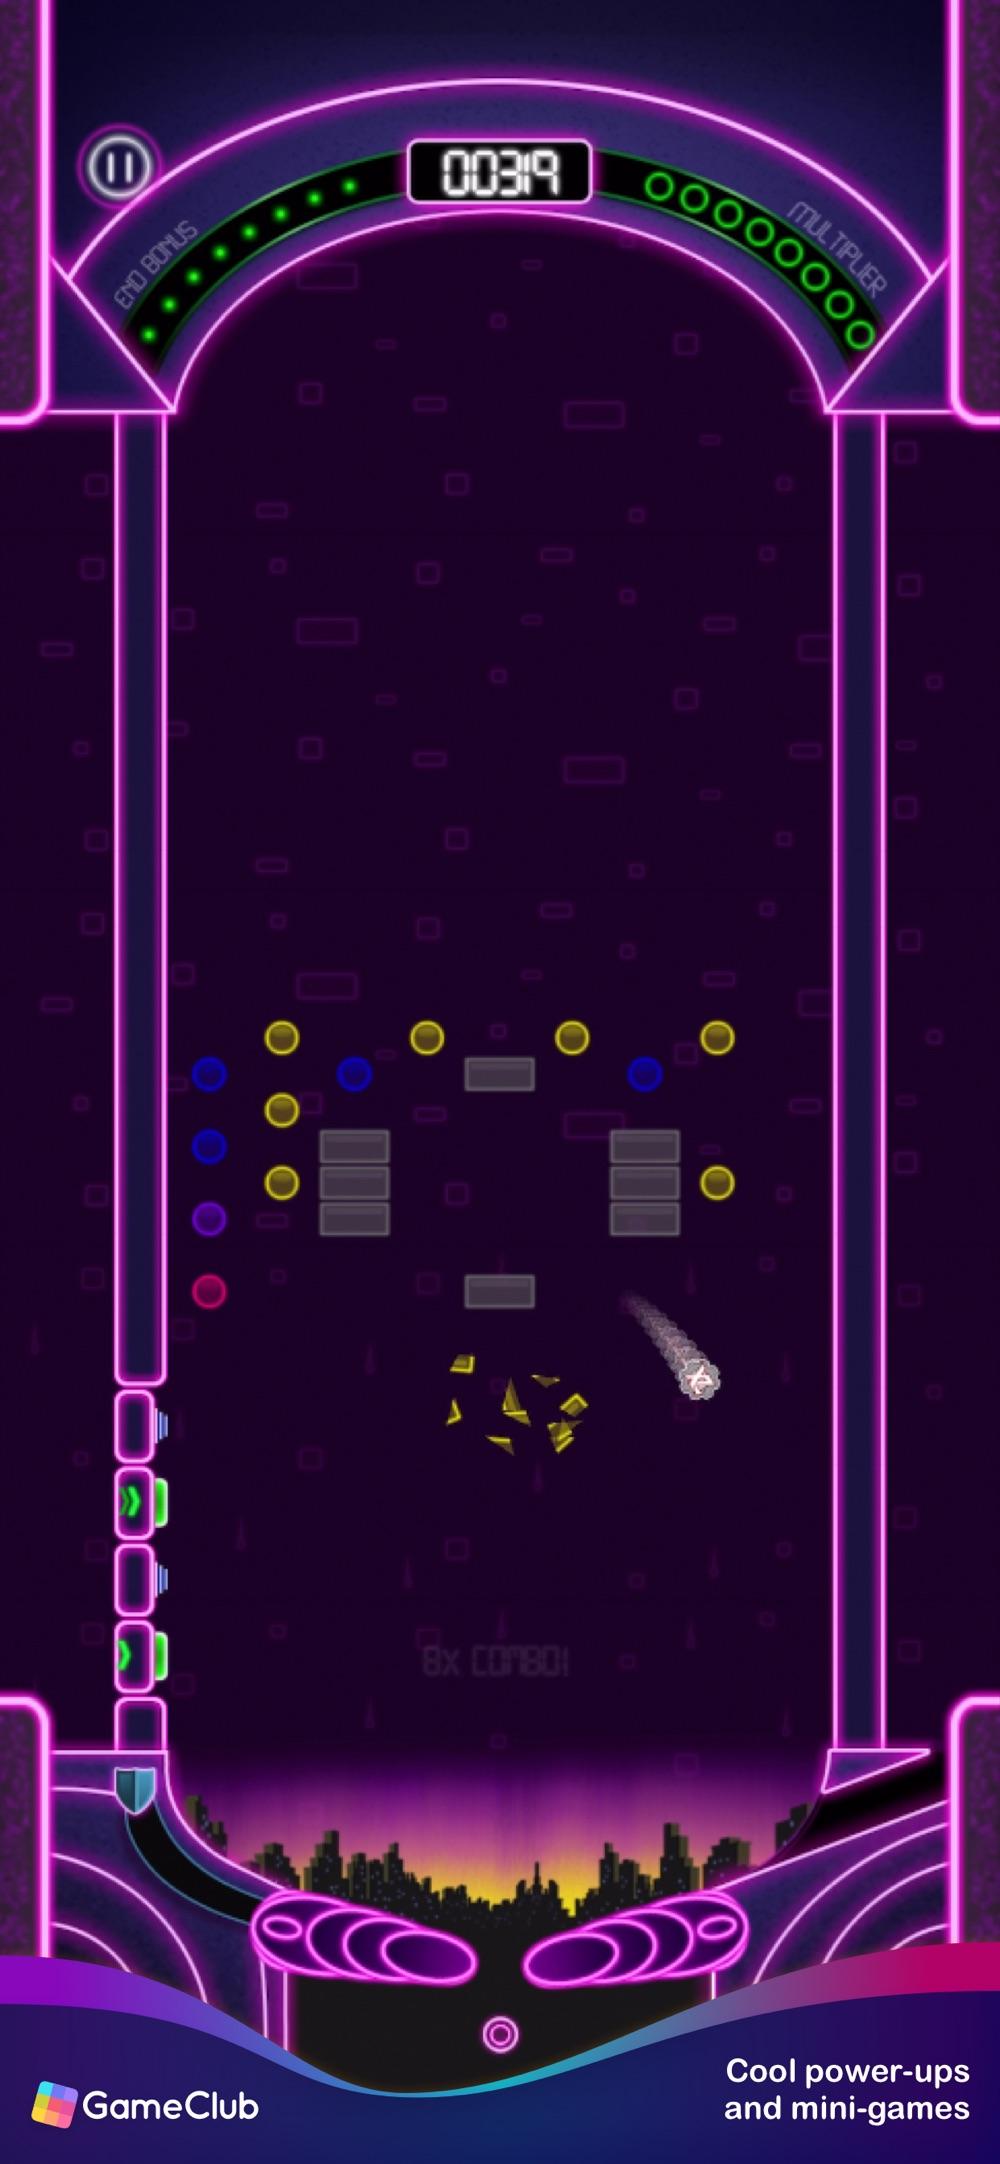 Pinball Breaker - GameClub hack tool